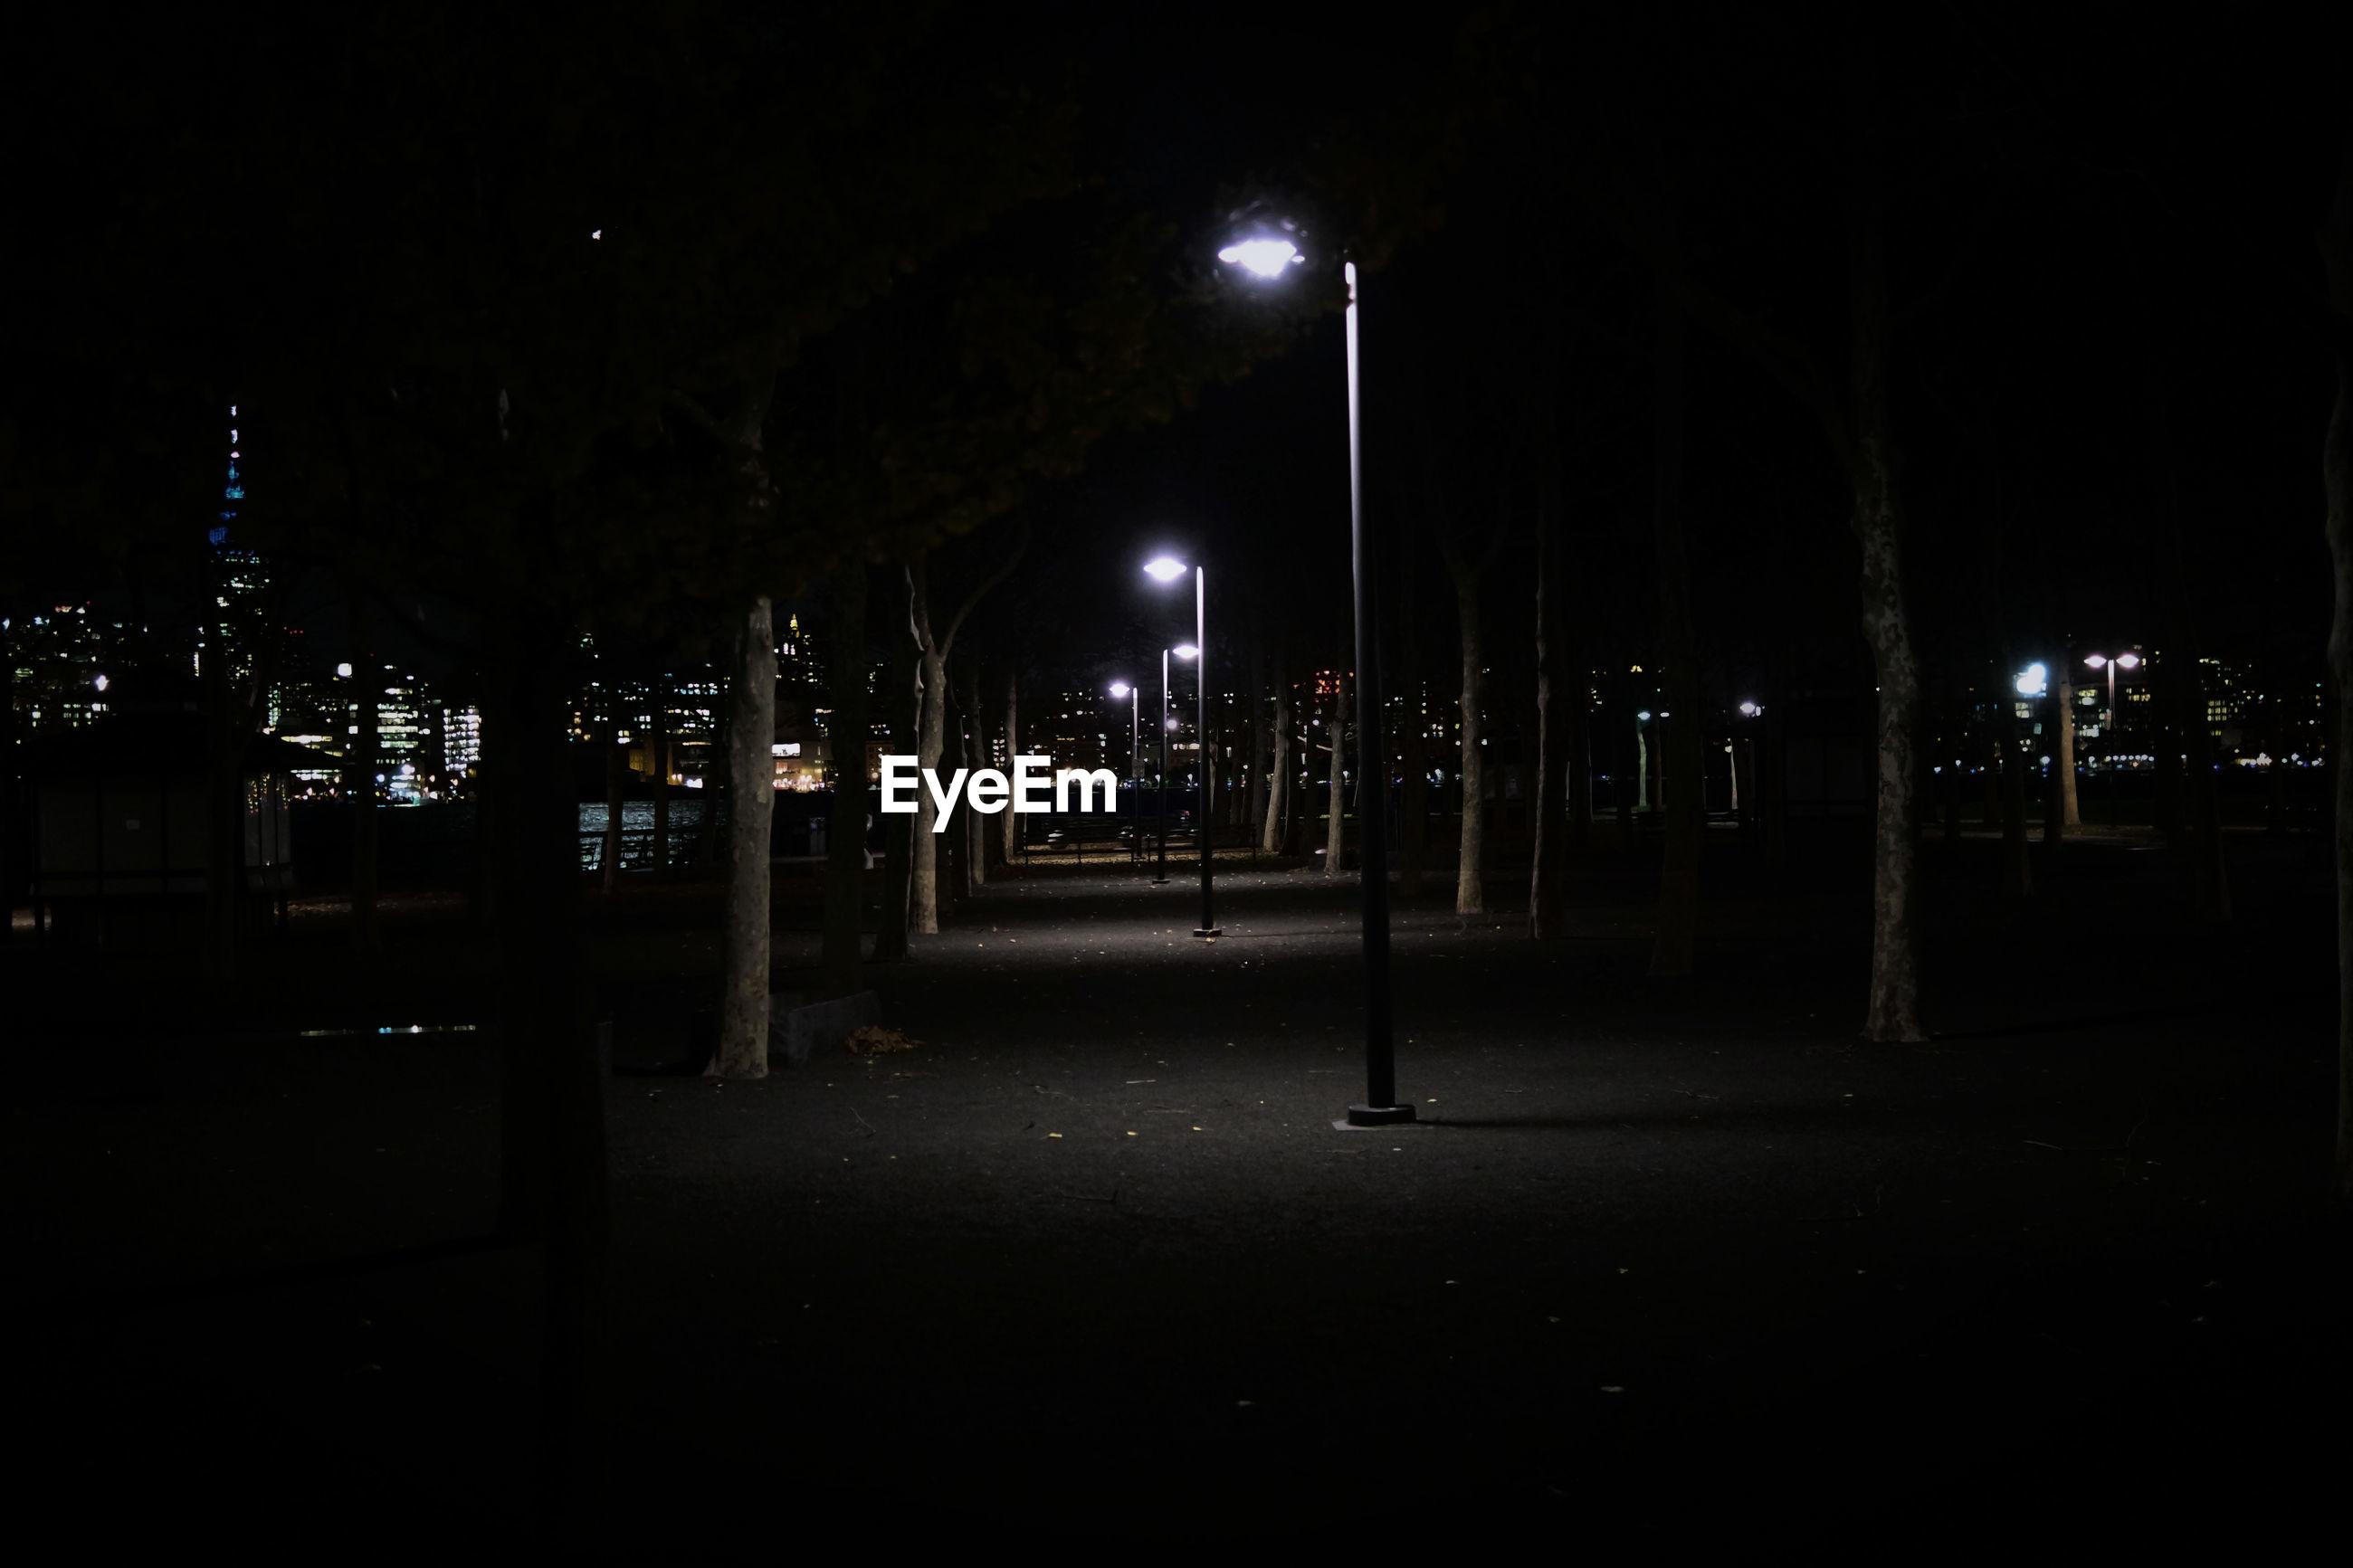 VIEW OF ILLUMINATED STREET LIGHT IN NIGHT